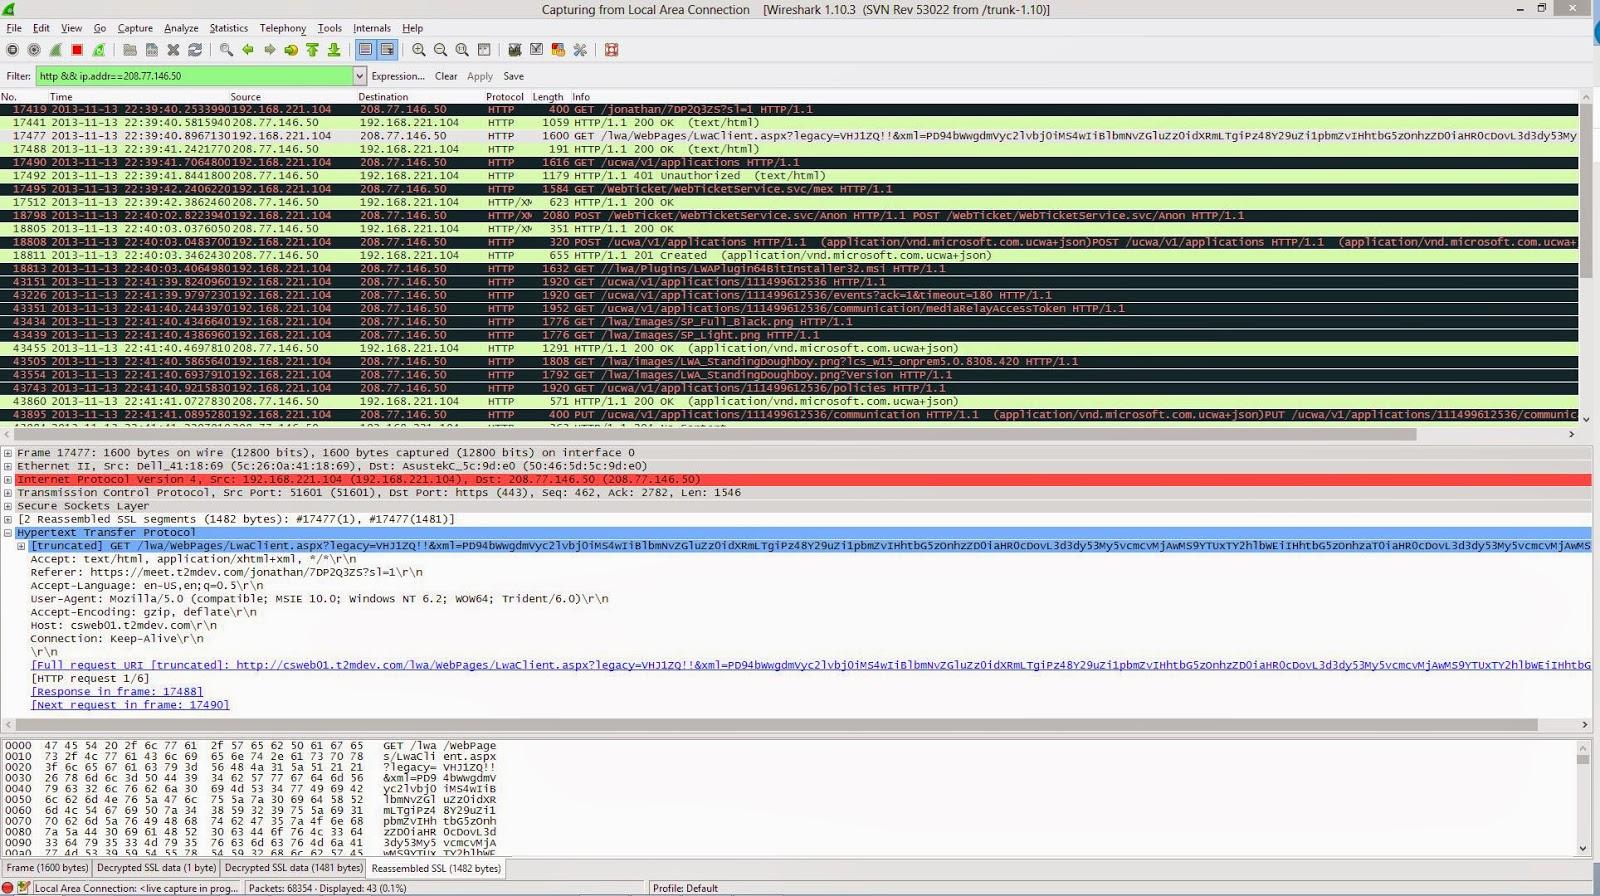 ucomsGeek: Using Wireshark to Decrypt Lync Communications